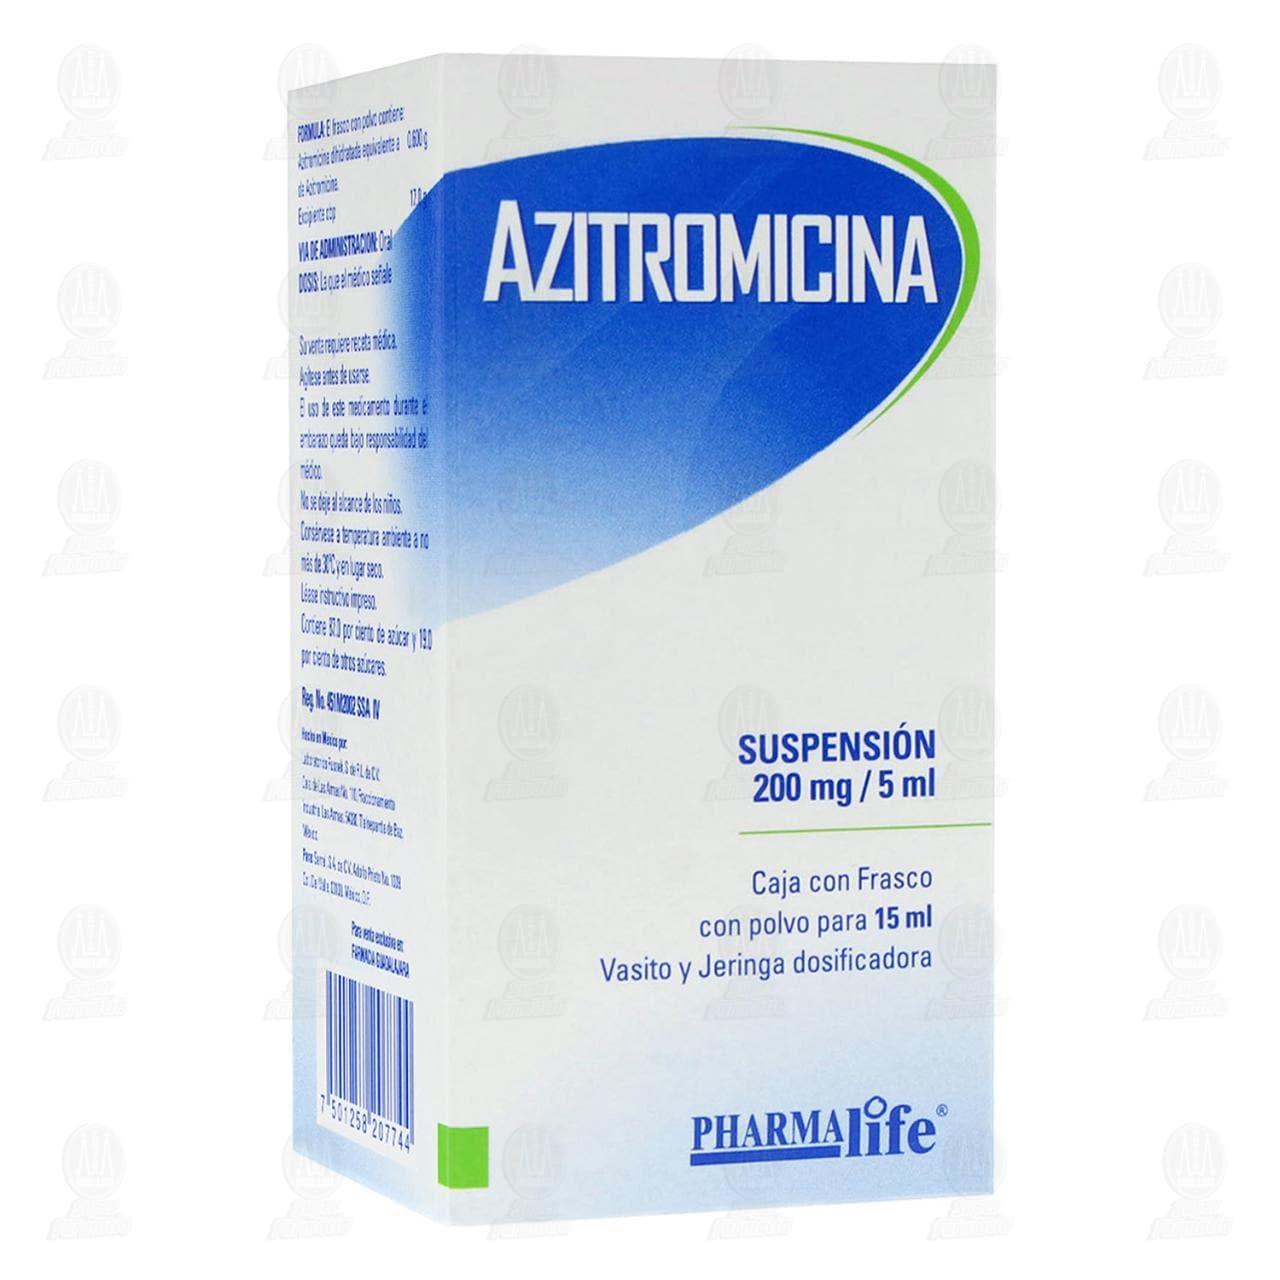 Comprar Azitromicina 200mg/5ml 15ml Suspensión Pharmalife en Farmacias Guadalajara